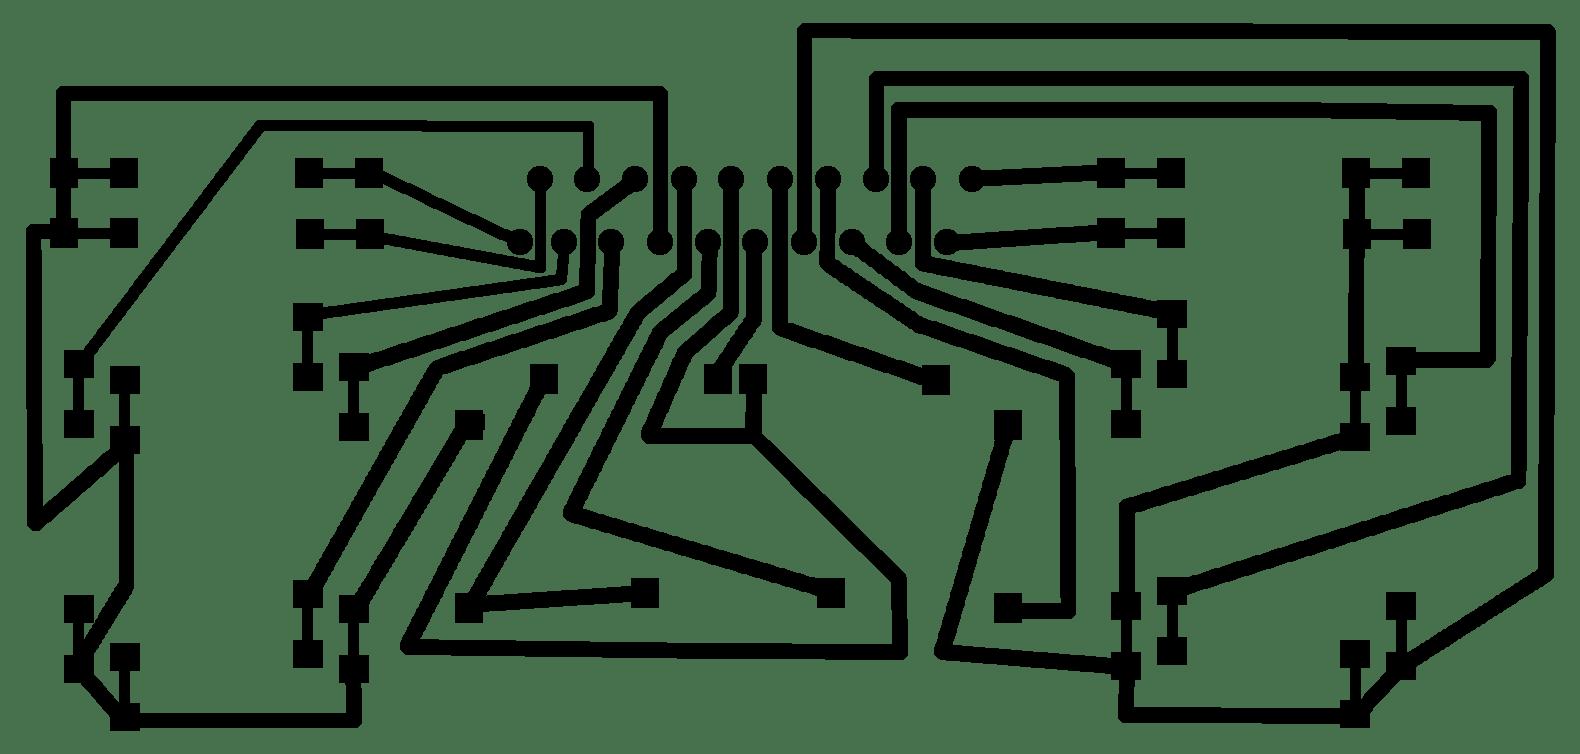 ps3 wifi circuit board xmods